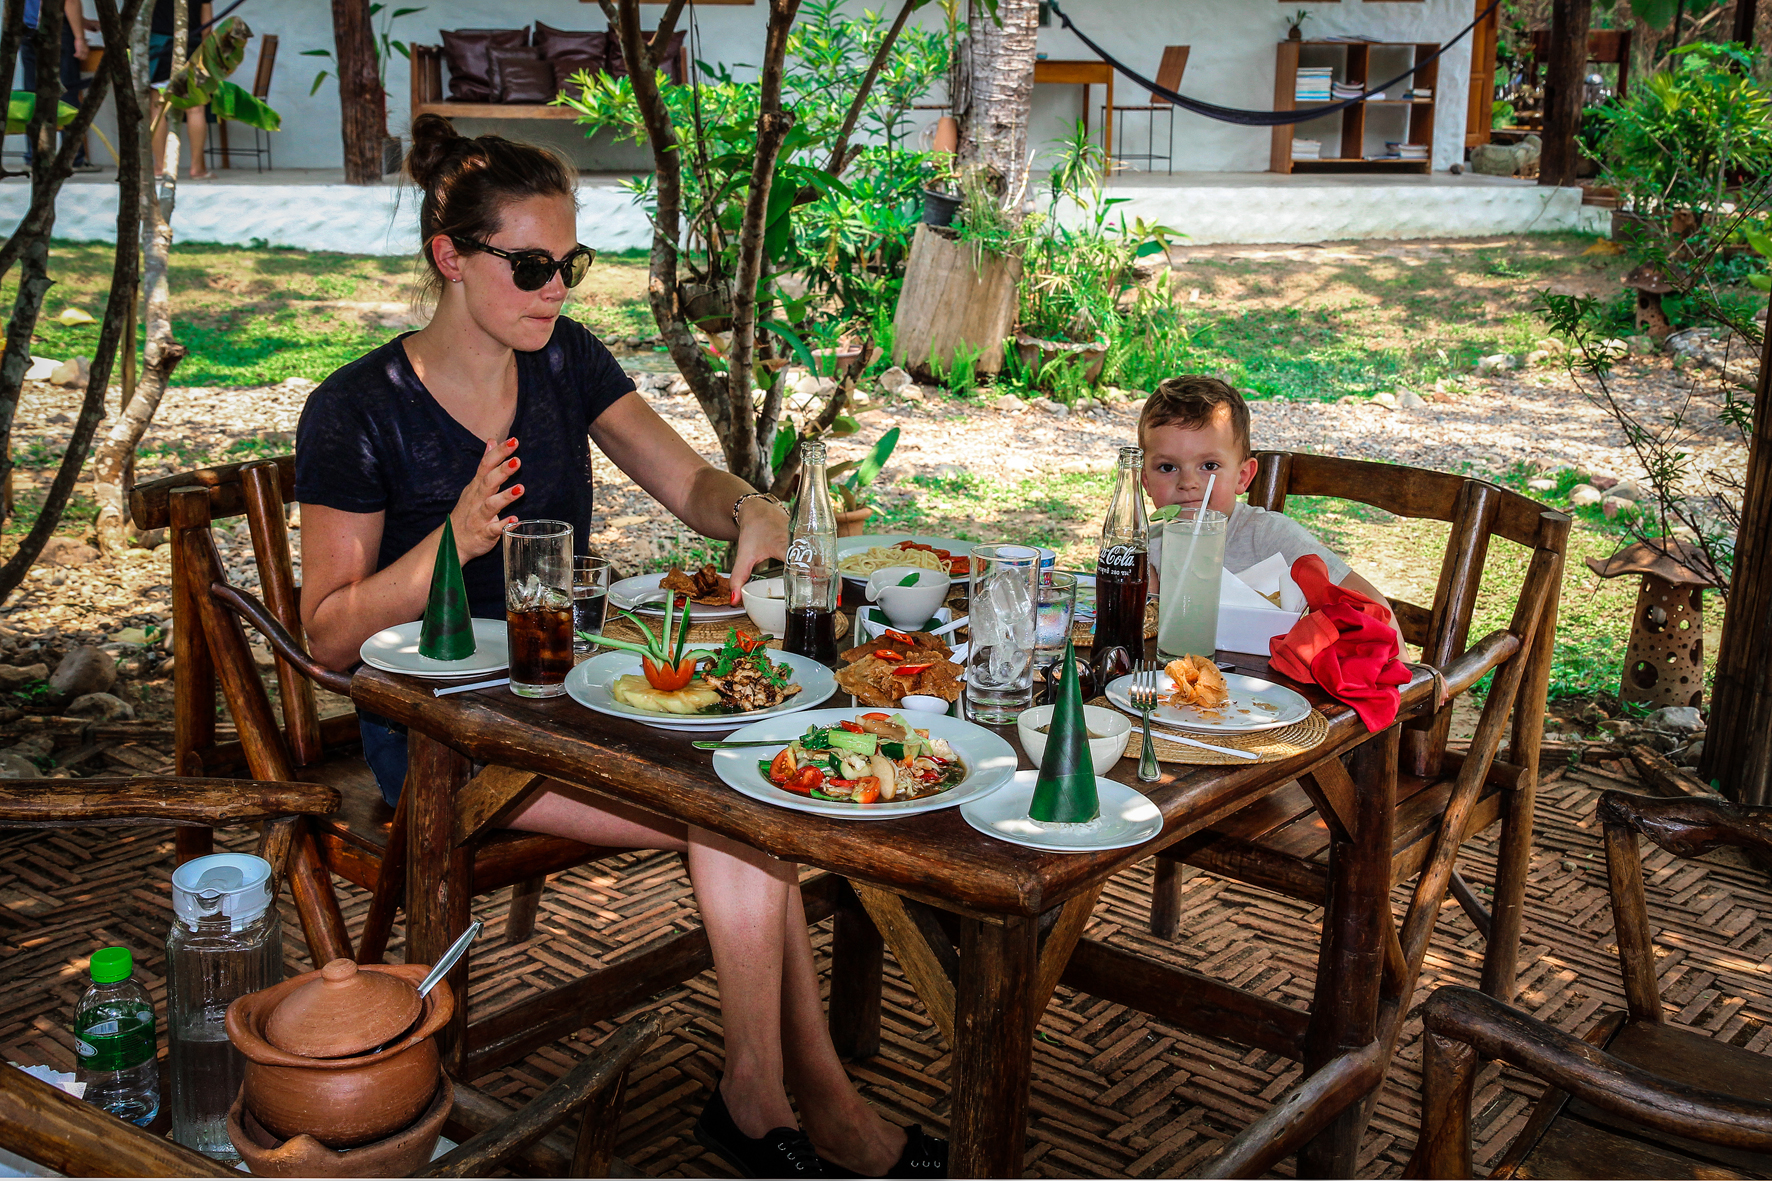 Reizen met Kinderen Thailand Chiang Mai - thai food.jpg